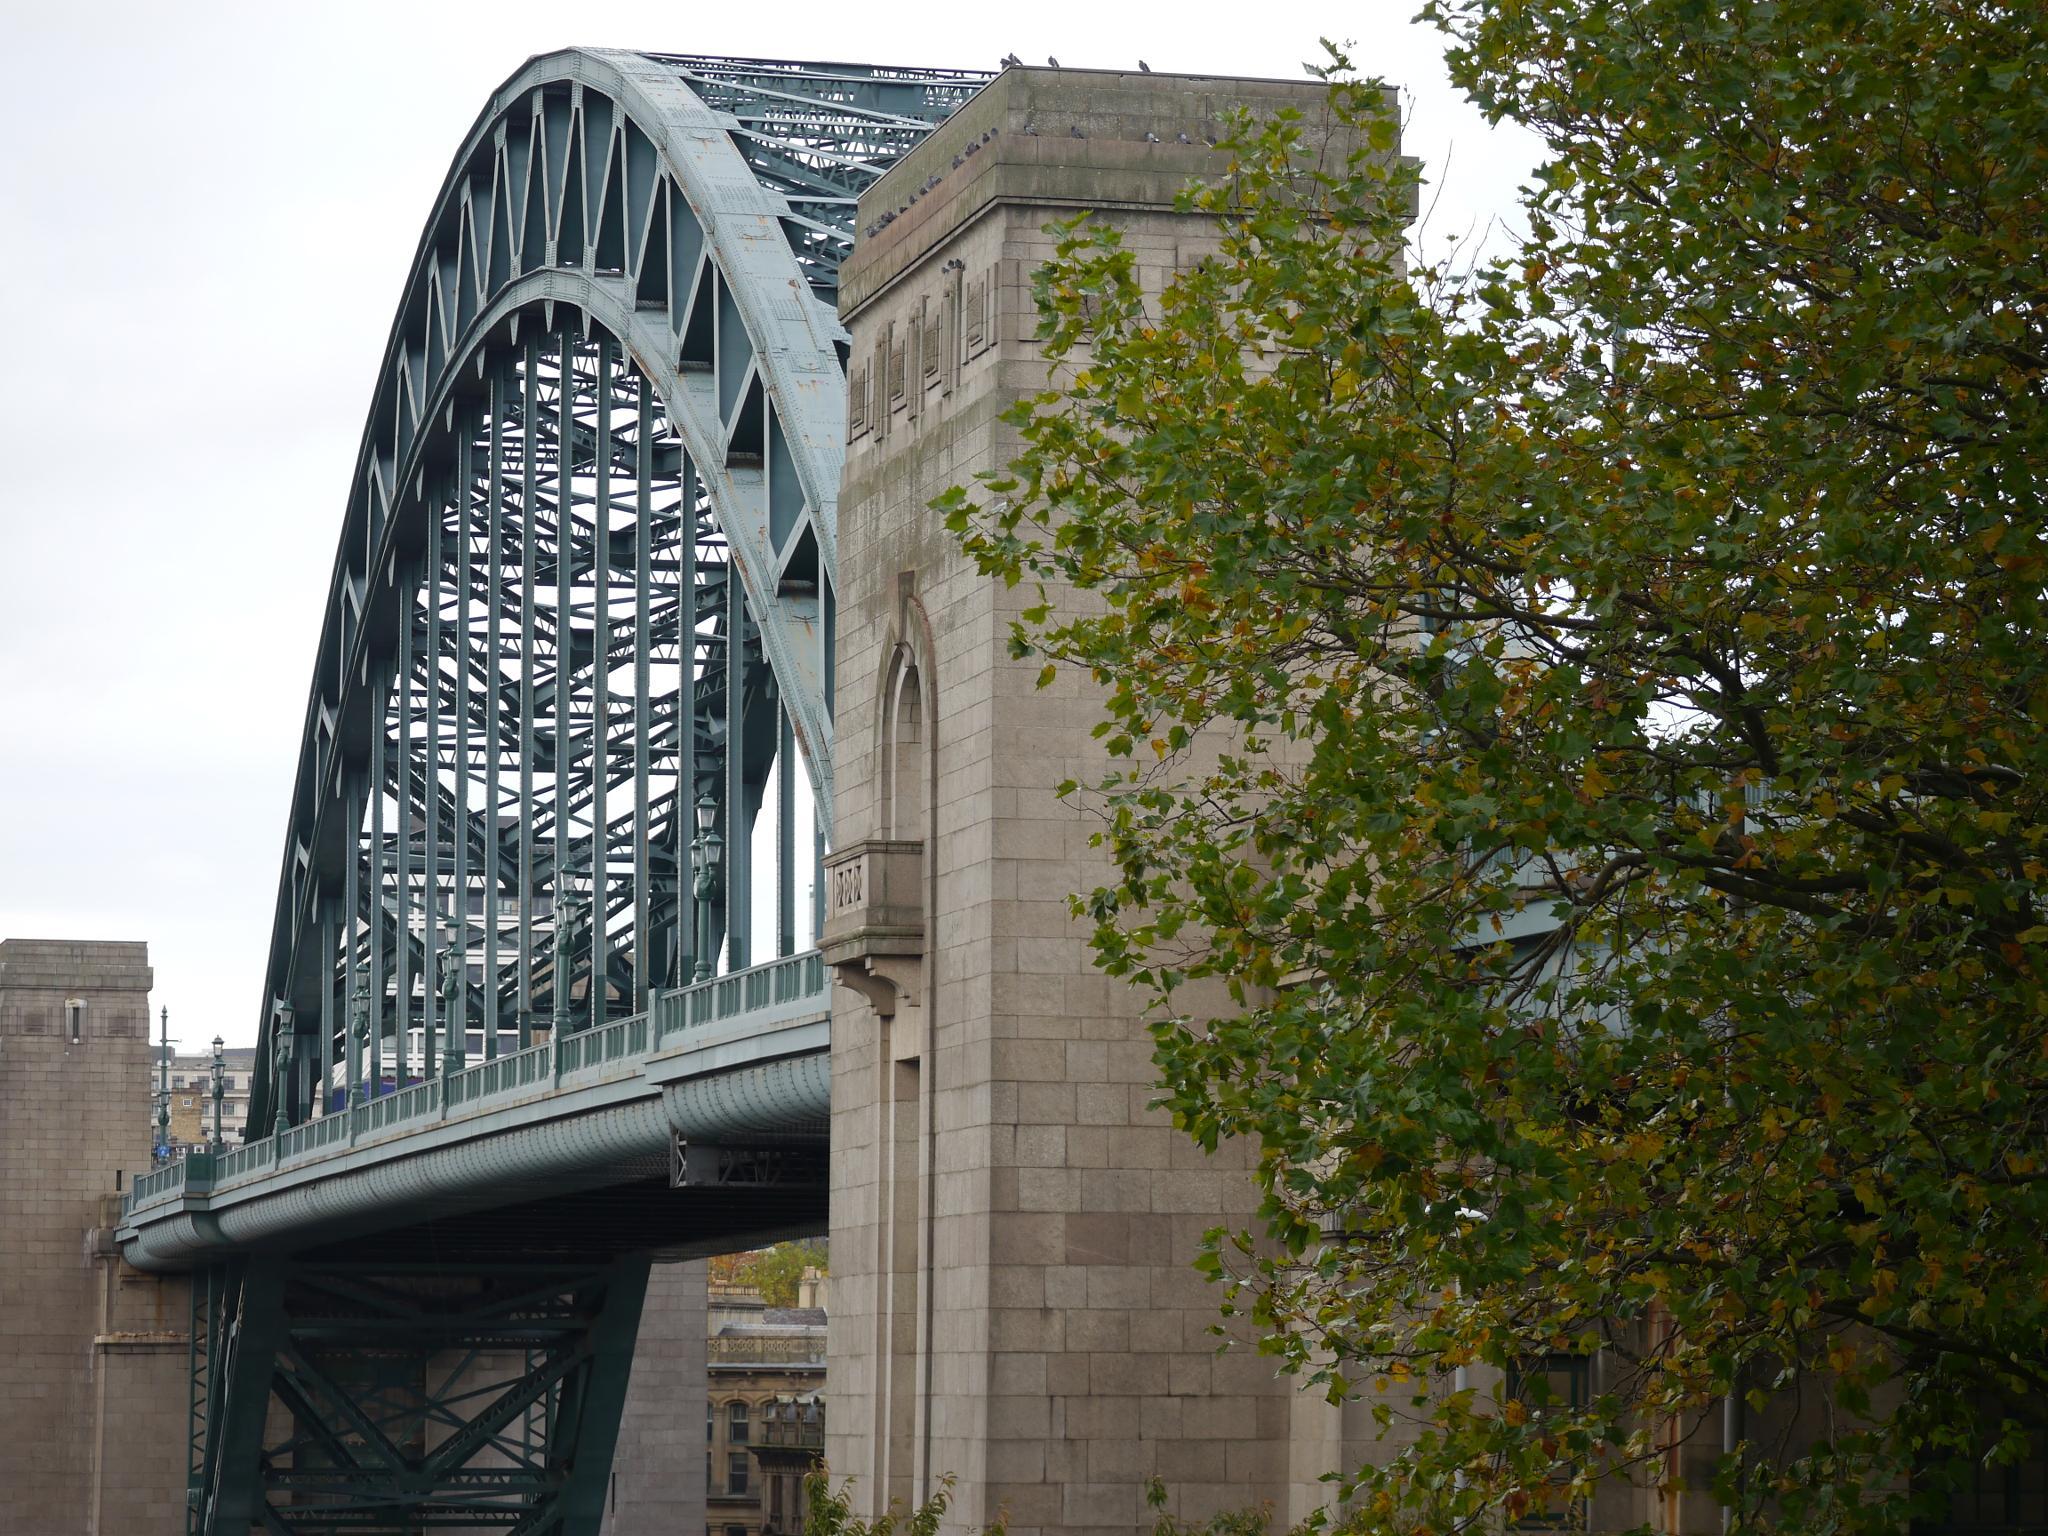 Tyne Bridge from the Gateshead side. by Darren Turner